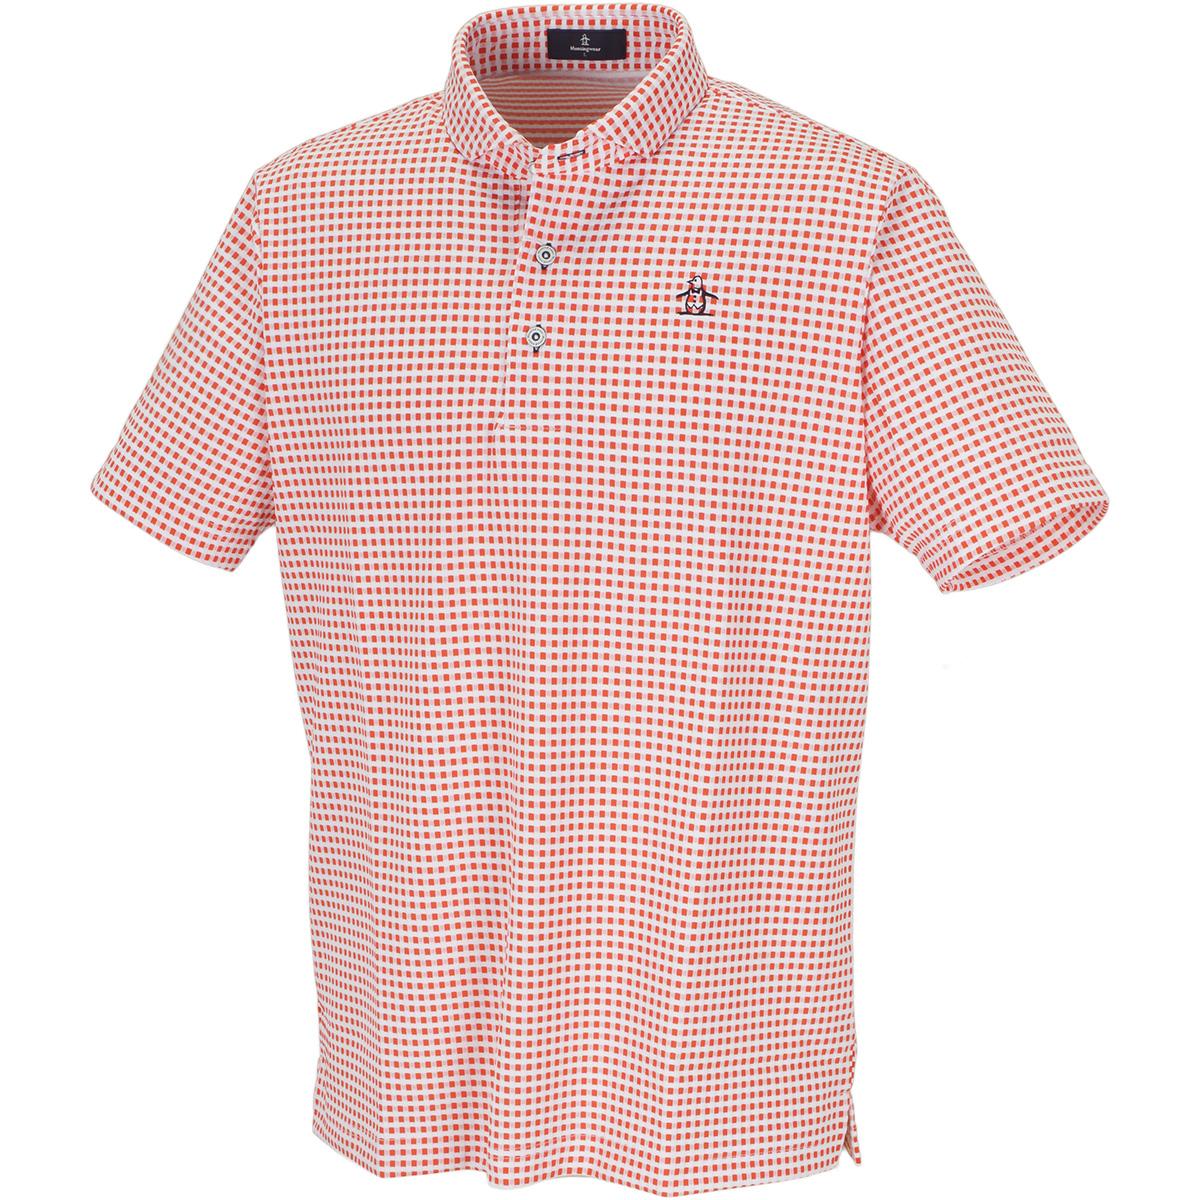 SUNSCREENギンガムジャカード半袖ポロシャツ